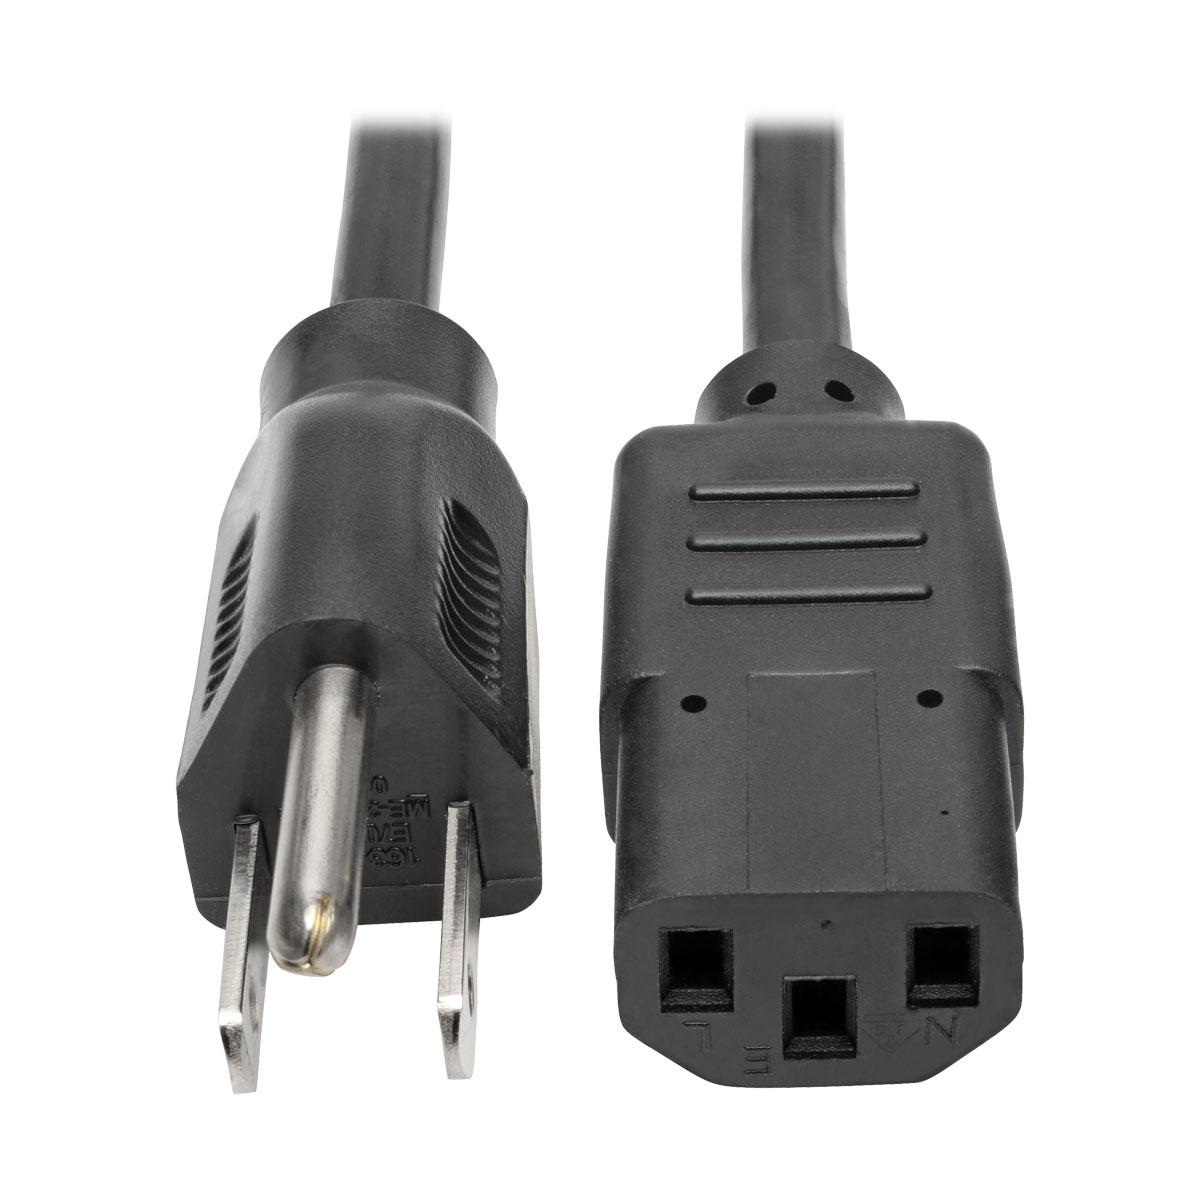 6ft 14 AWG Universal Power Cord IEC320 C13 to NEMA 5-15P SJT 15A